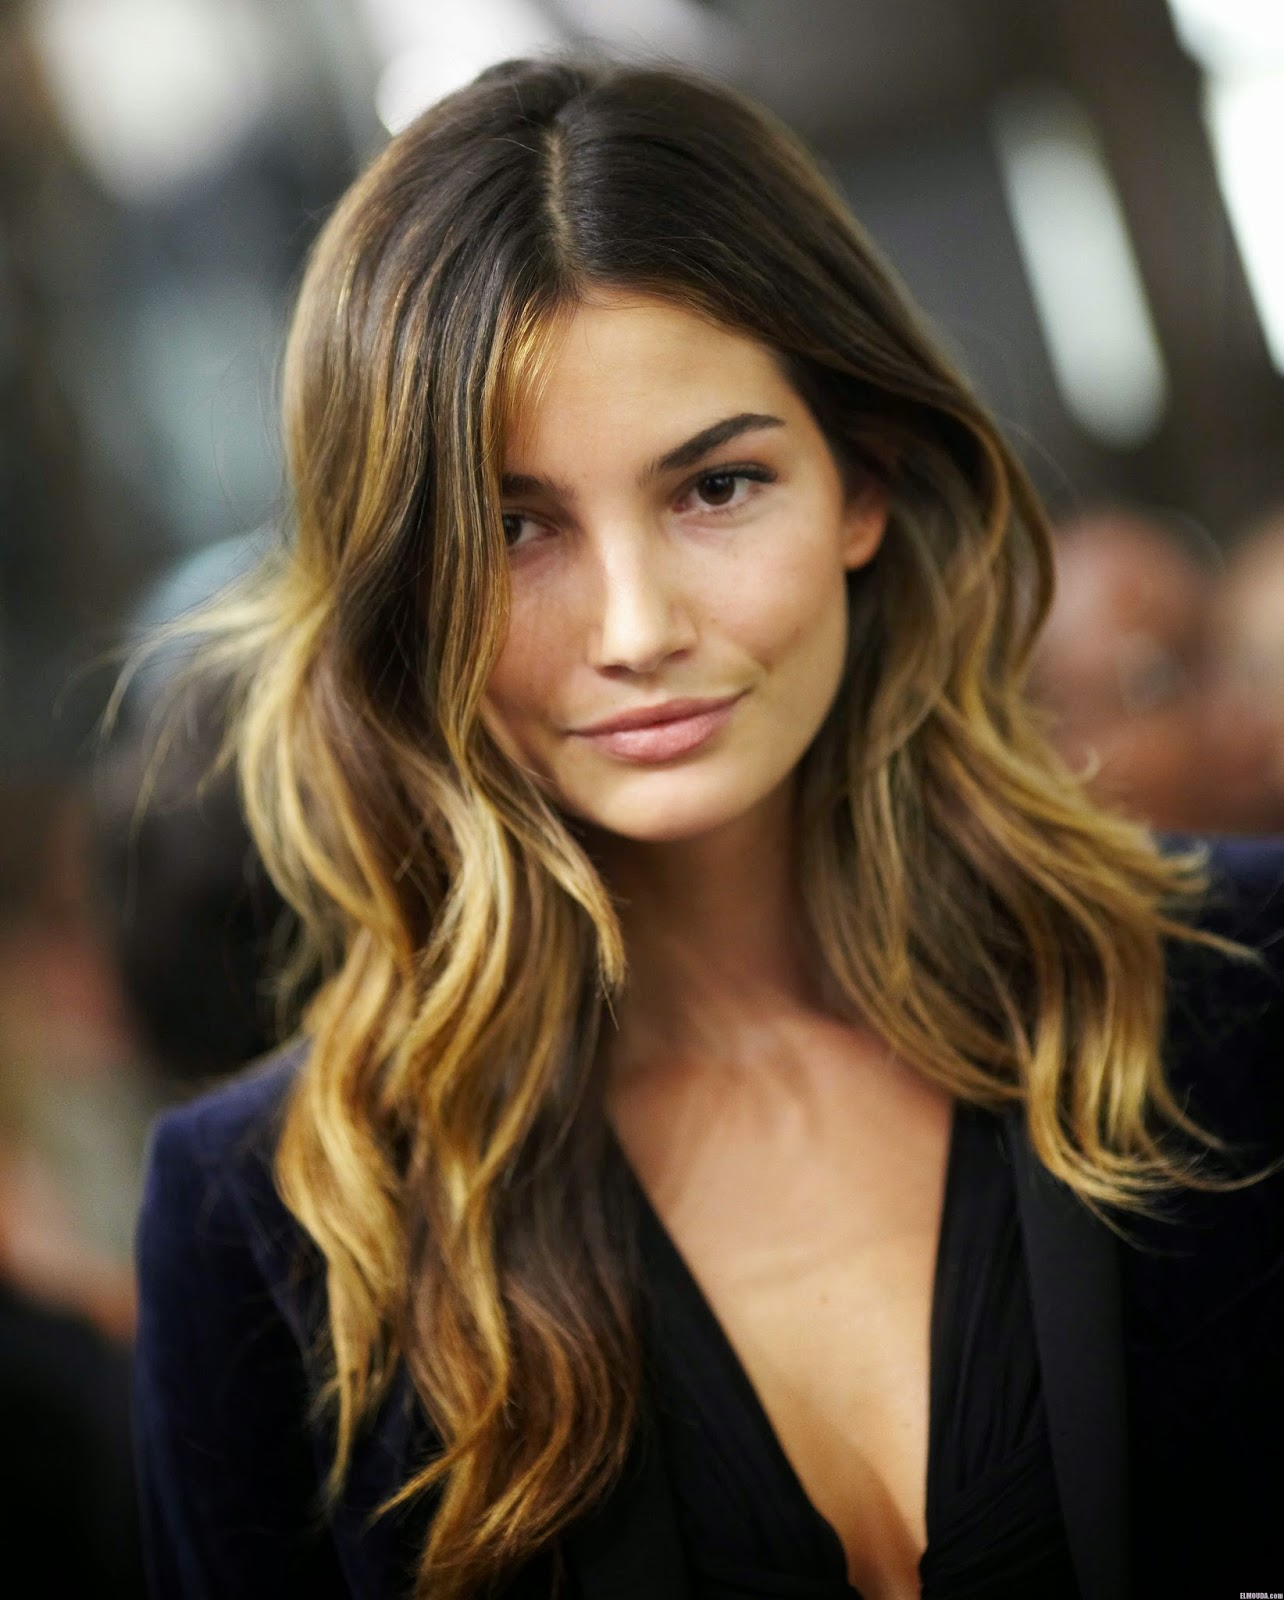 Luxuryb عن تجربة صبغة الشعر الأومبري من لوريال باريس